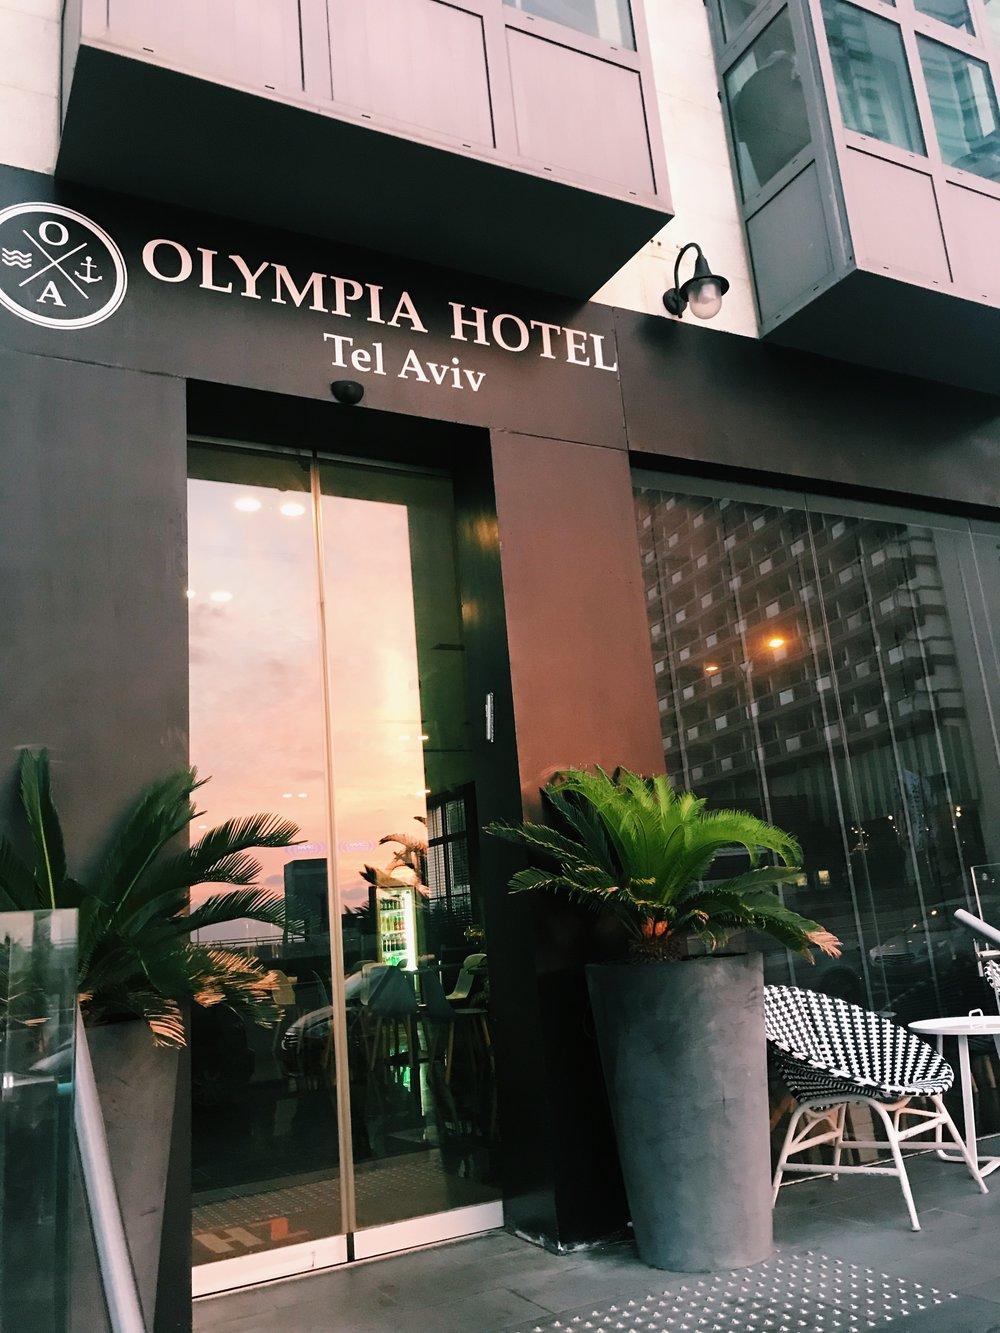 @olympiahotel